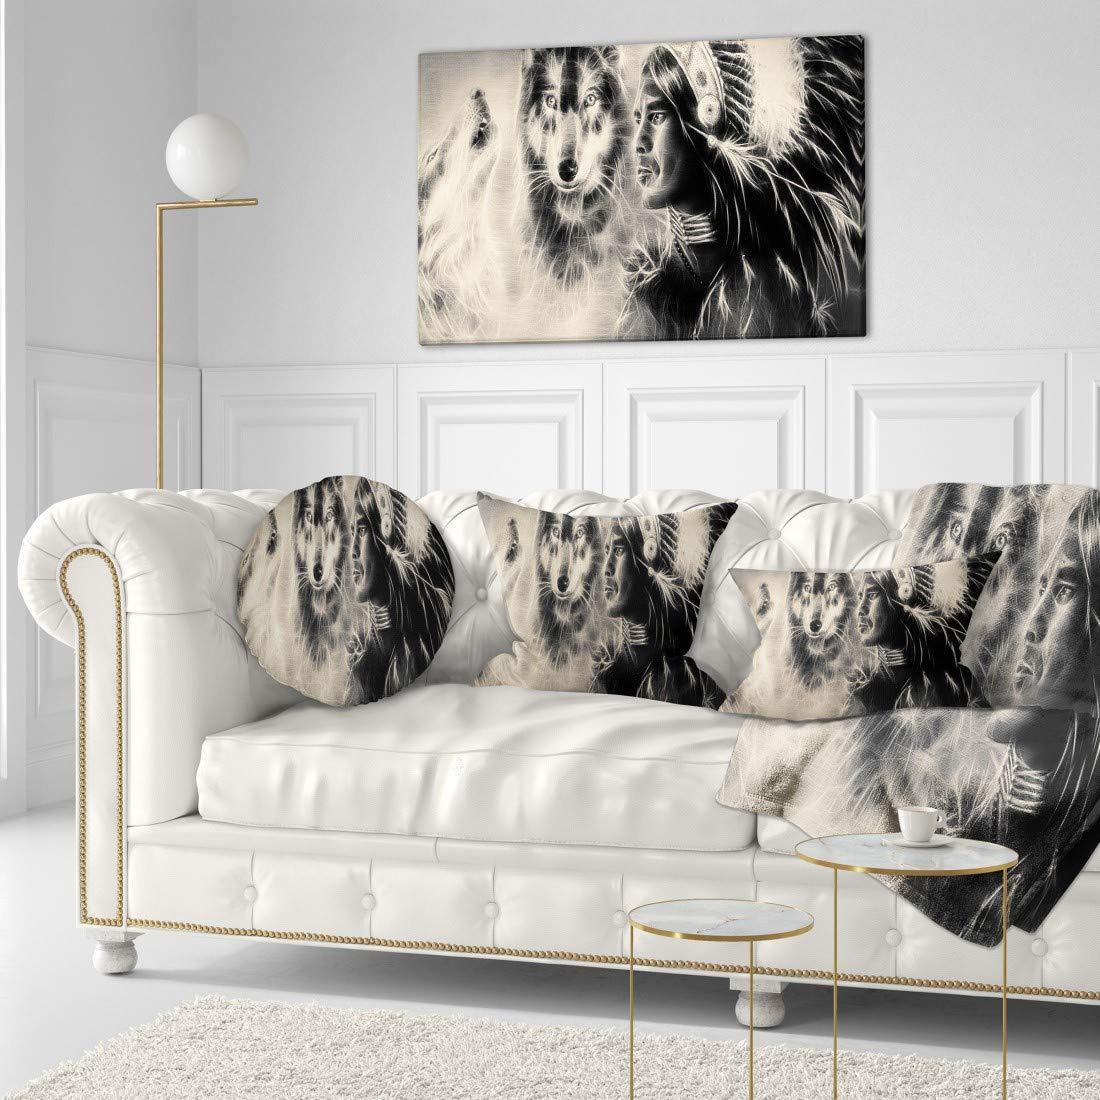 Designart Pt7185 40 20 Indian Warrior With Wolves Digital Art Canvas Print 40 X 20 Amazon In Home Kitchen